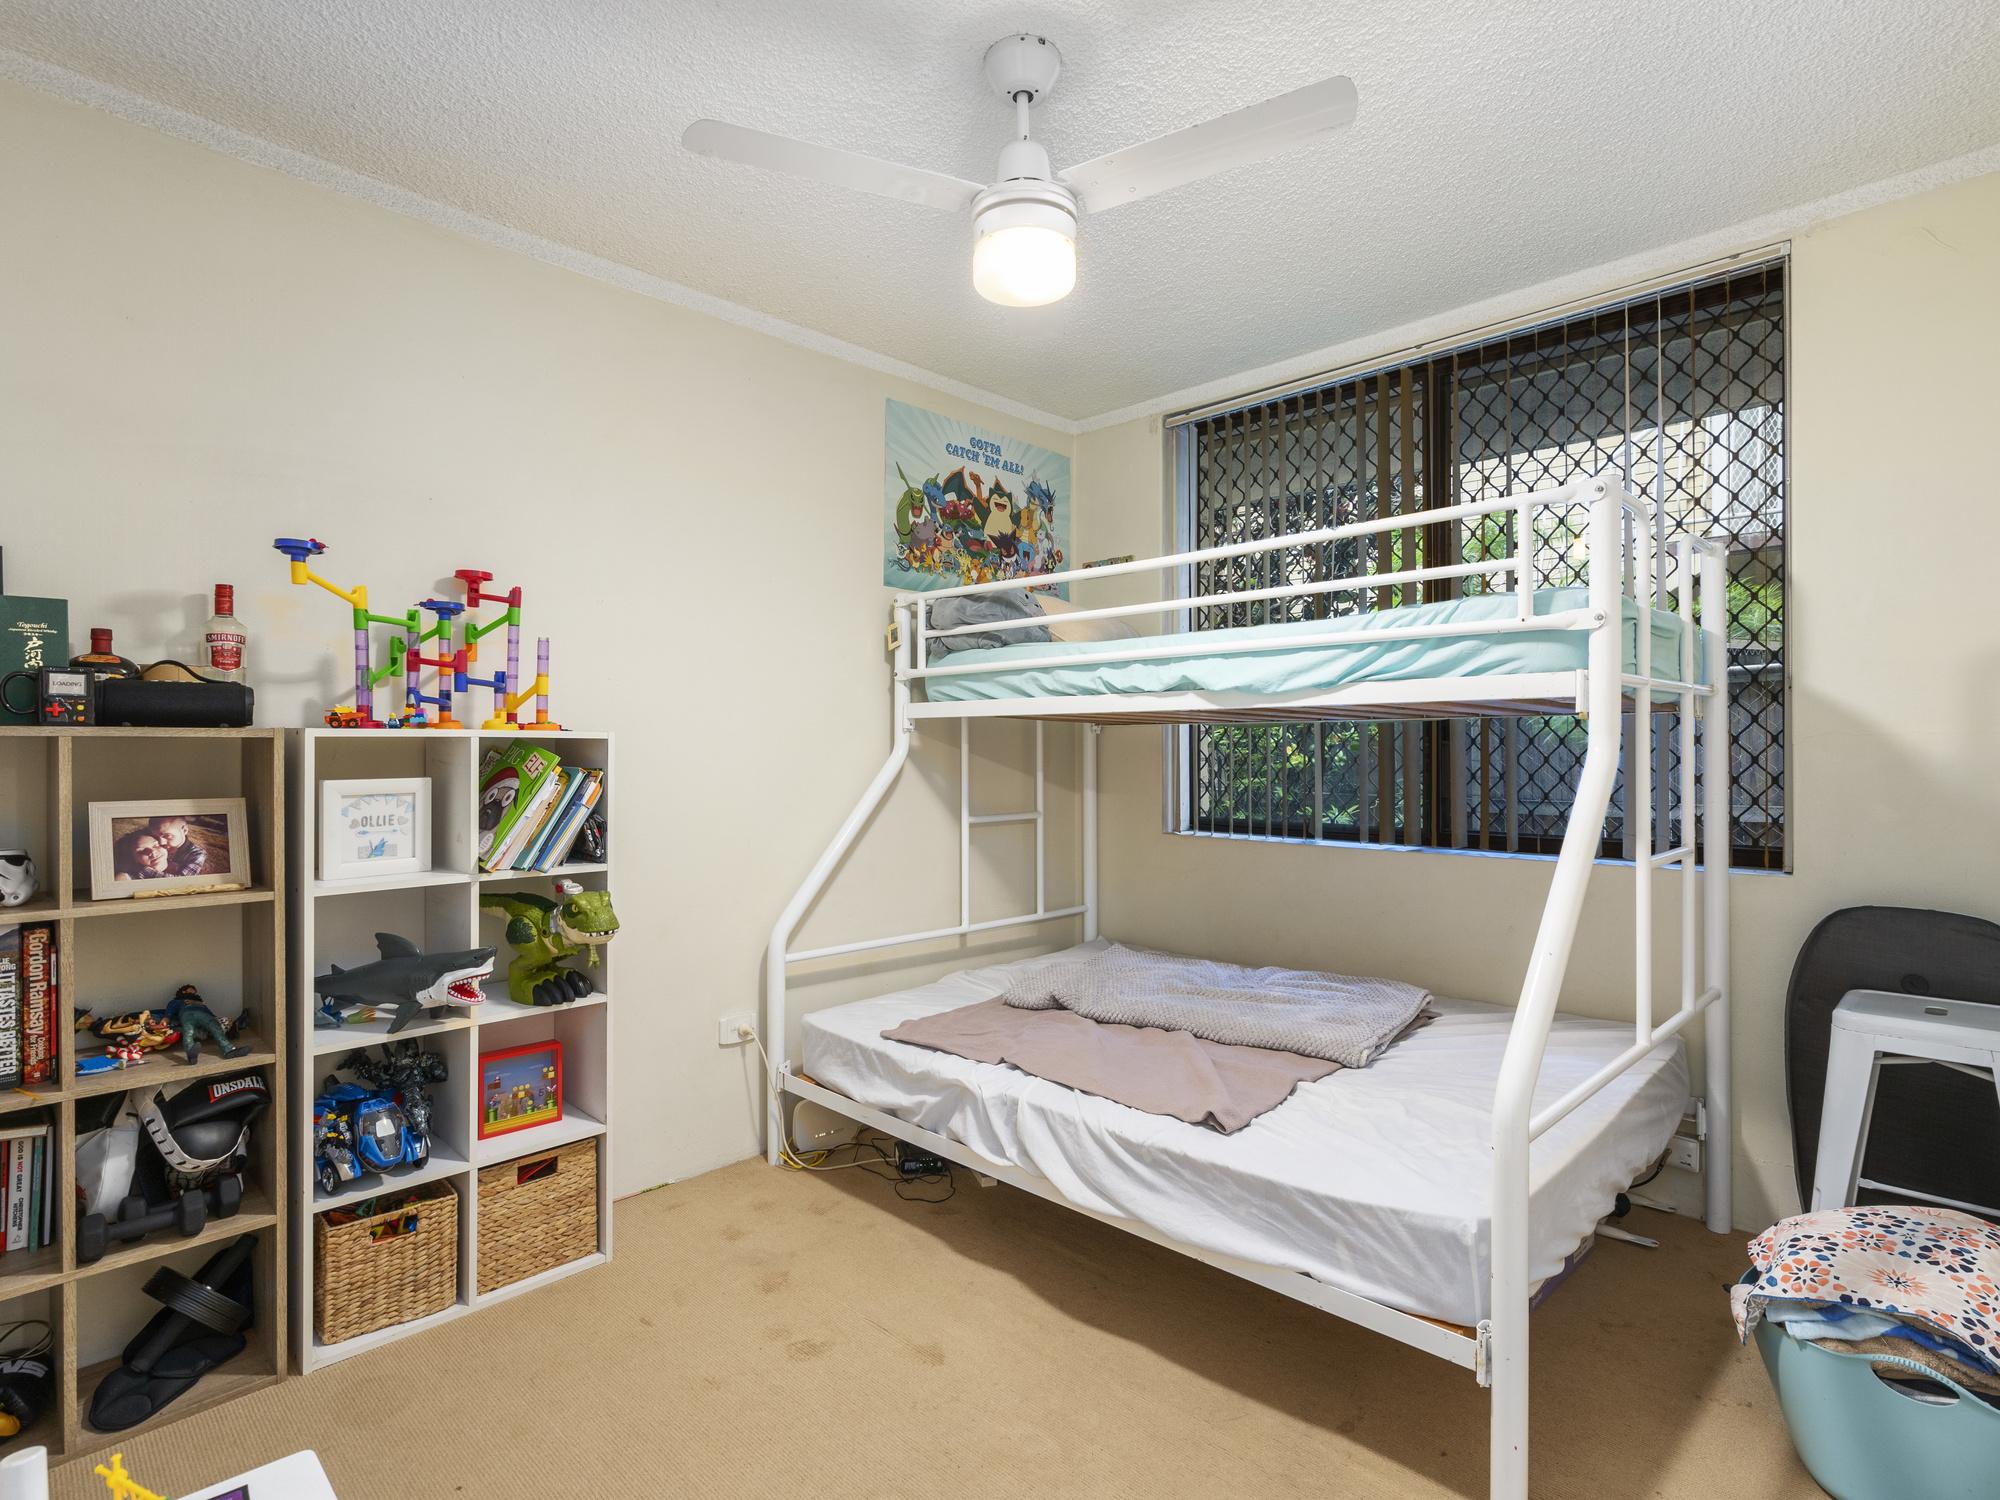 Real Estate | Gold Coast | Chevron Realty | 008 Open2view Id698602 2 33 Darrambal Street